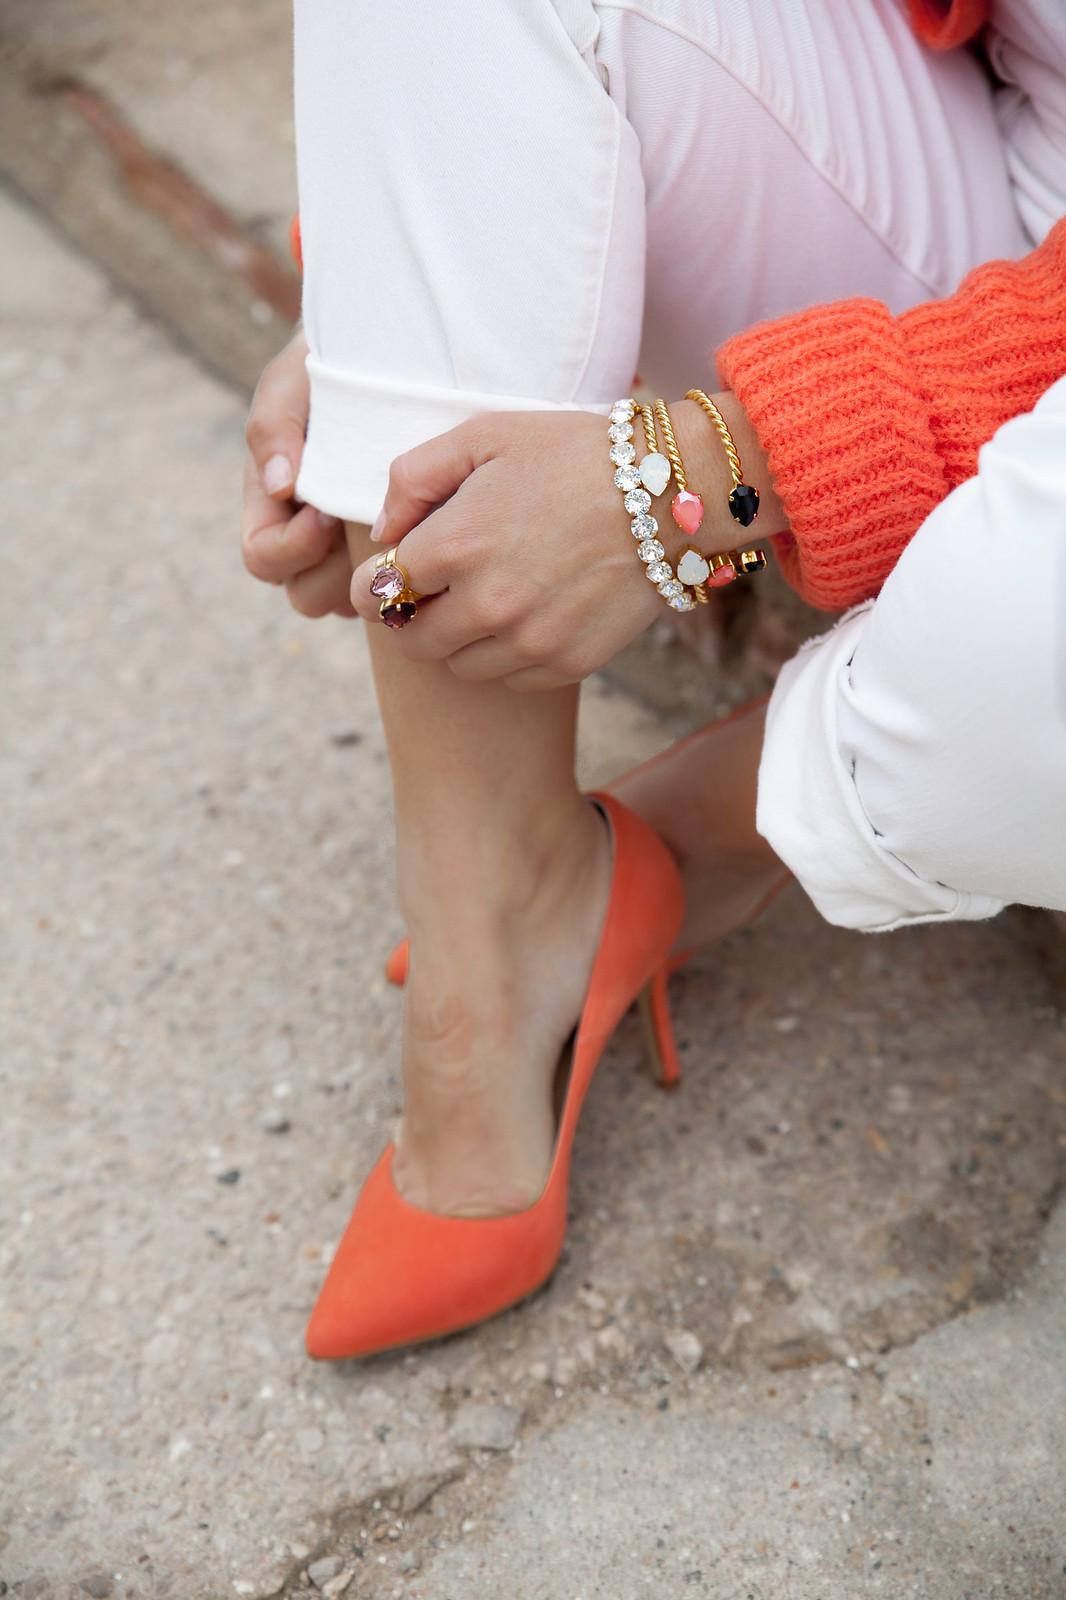 02_Burberry_Outfit_White_overall_Combinar_peto_con_tacones_mas34_theguestgirl_influencer_barcelona